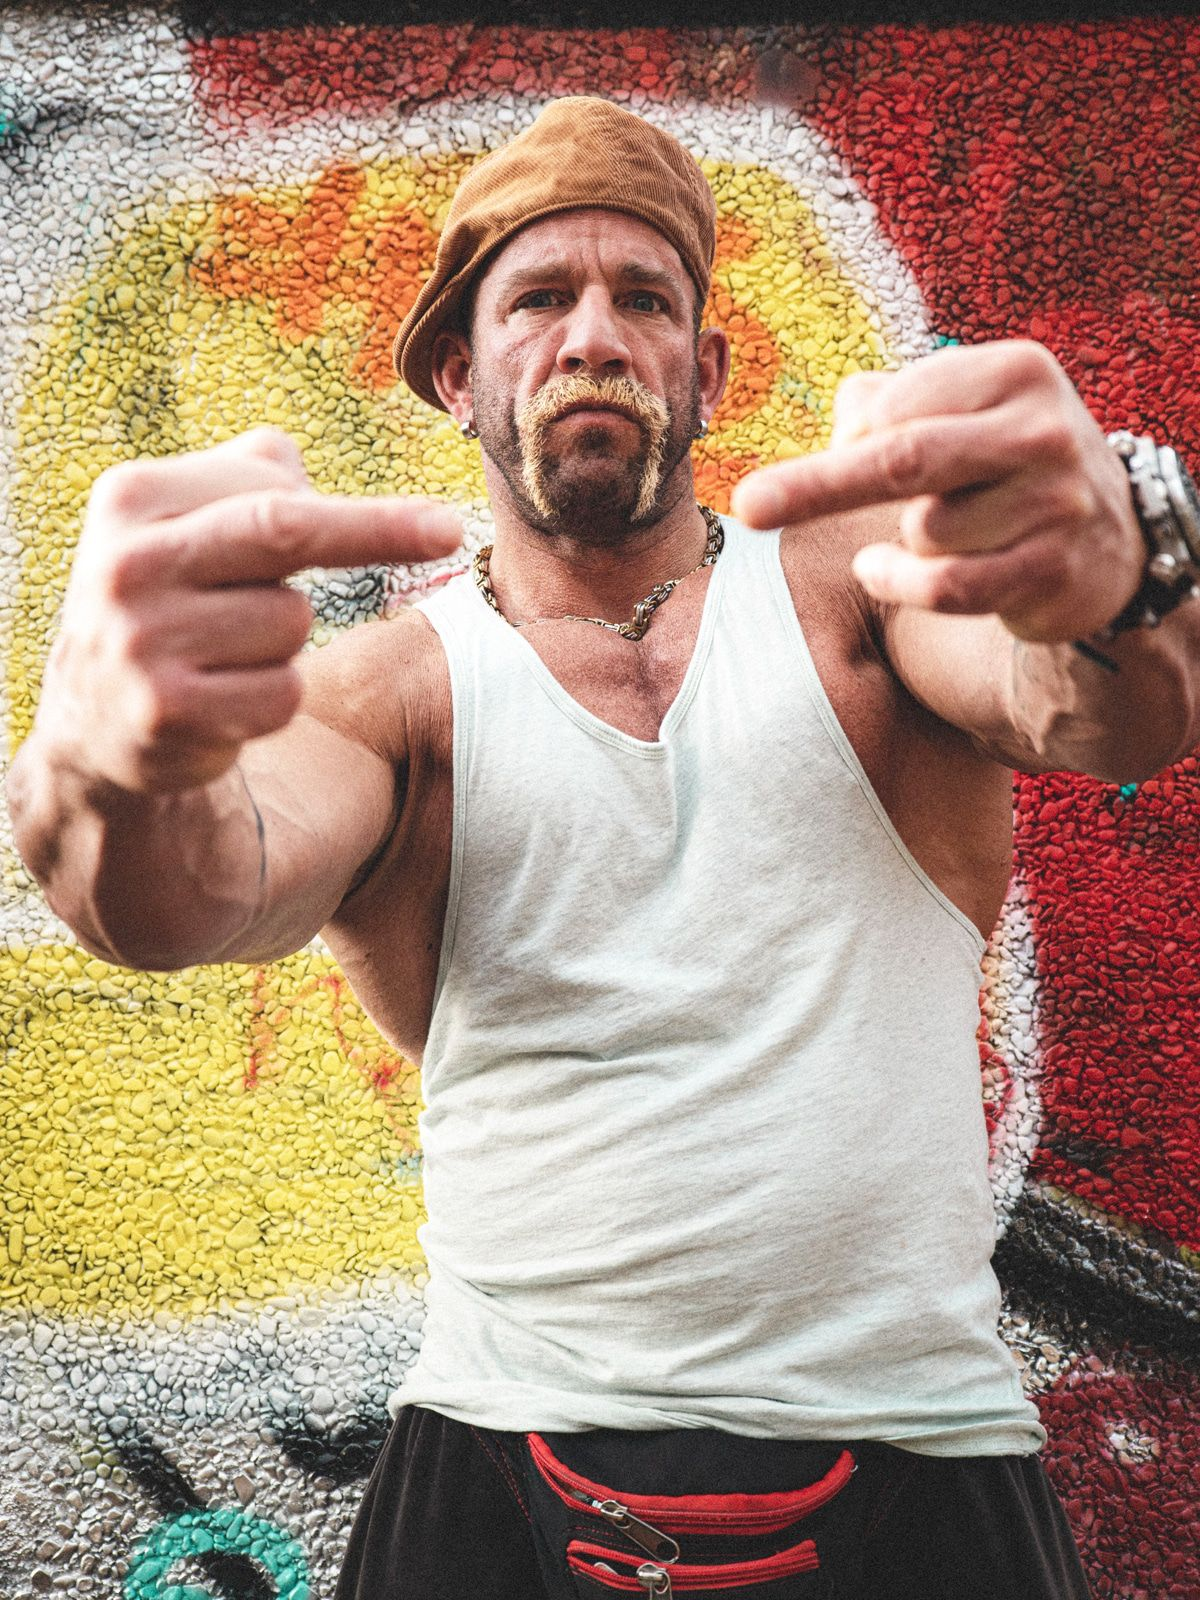 Hollywood-Matze: Alles über den Hamburger Hulk Hogan